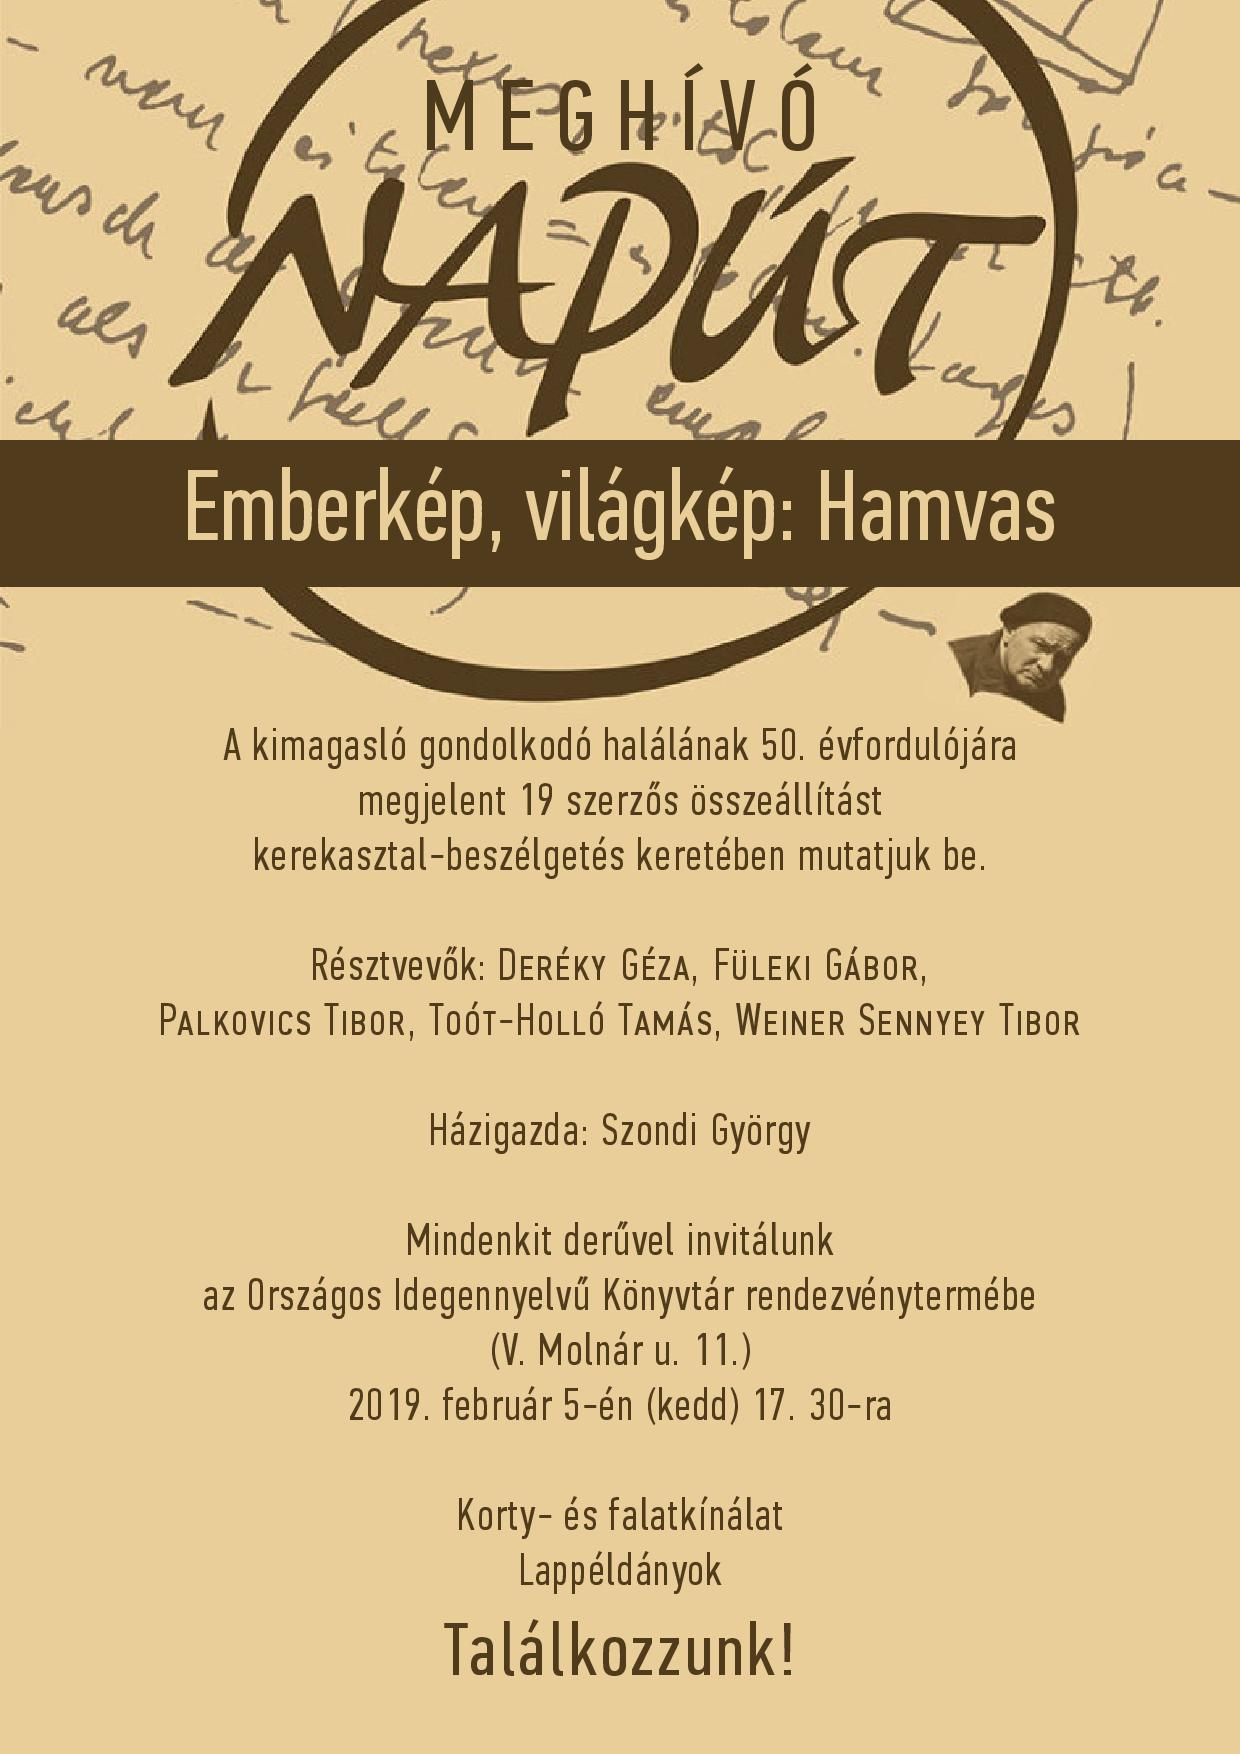 Naputest_Hamvas-page-001